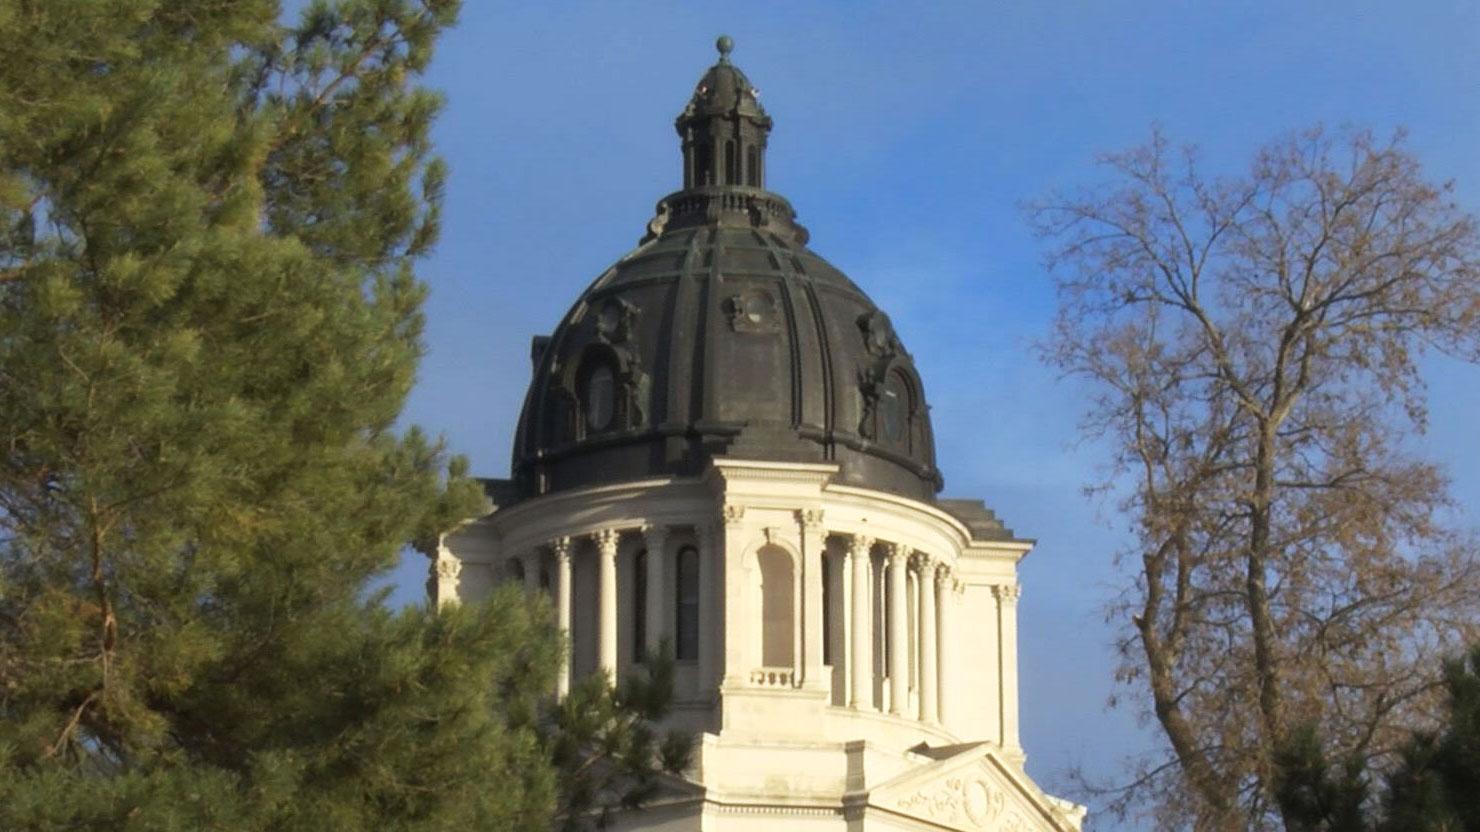 KELO pierre capitol building